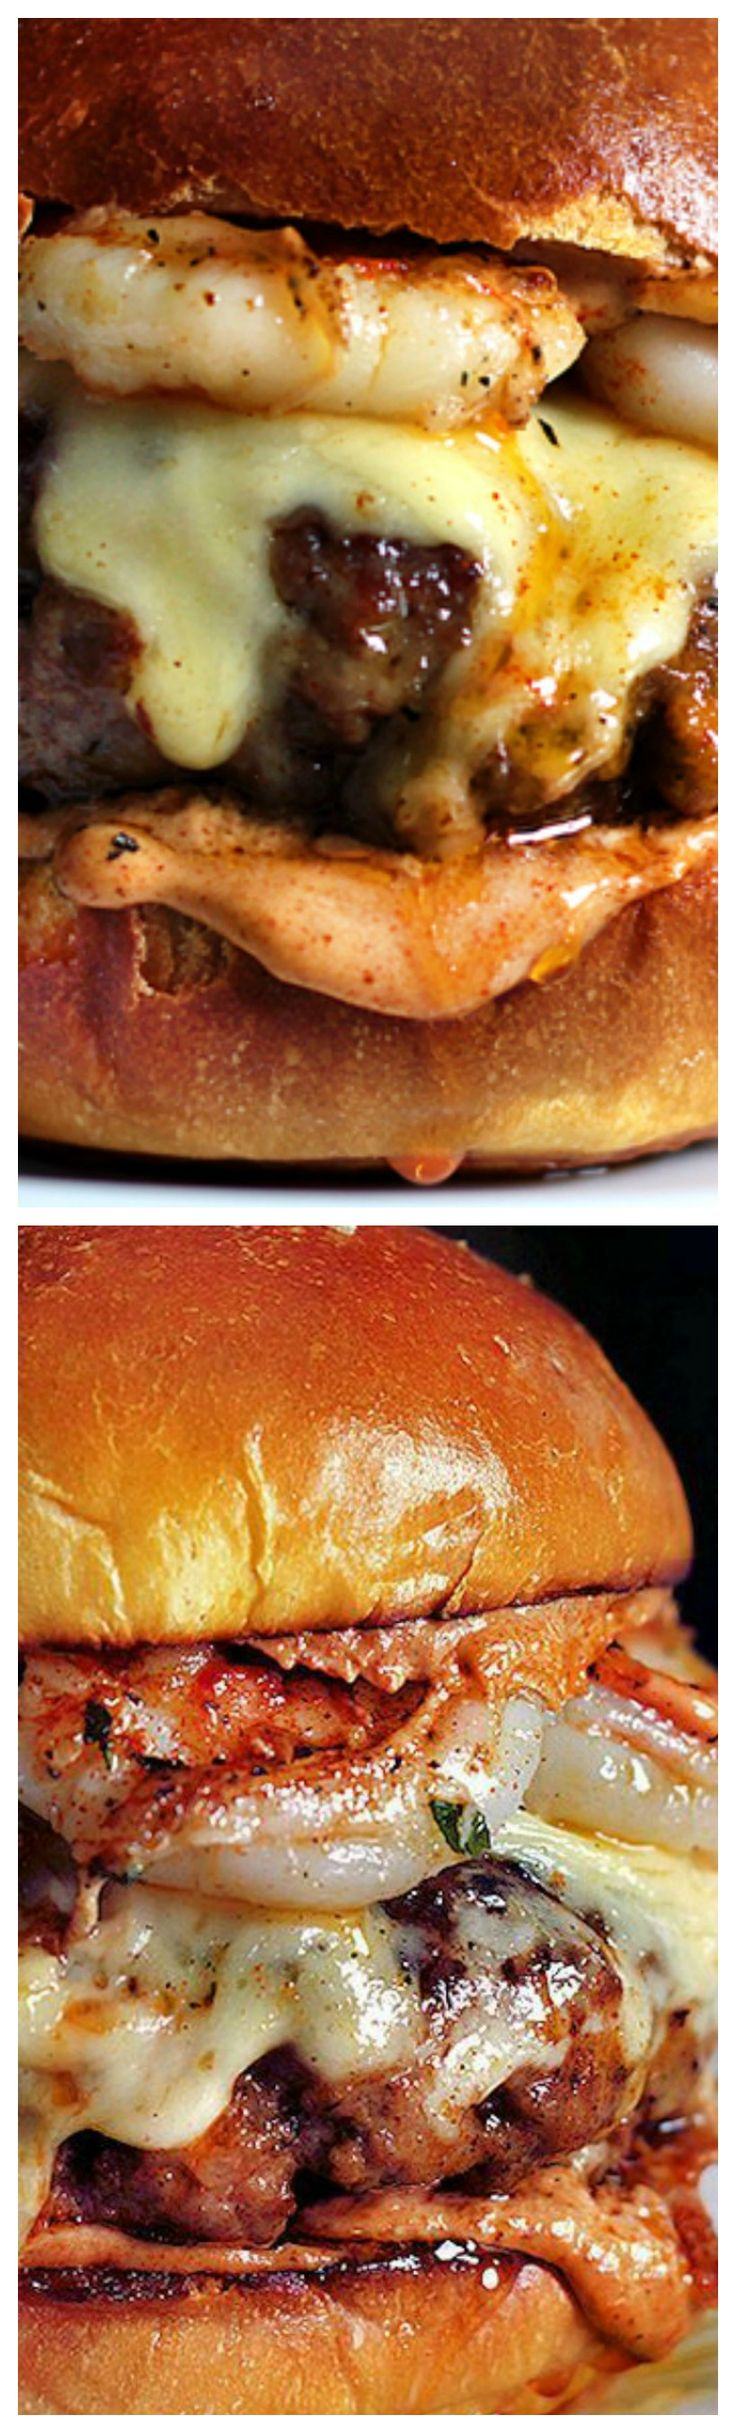 Mexican Chorizo and Garlic Shrimp Burger Recipe